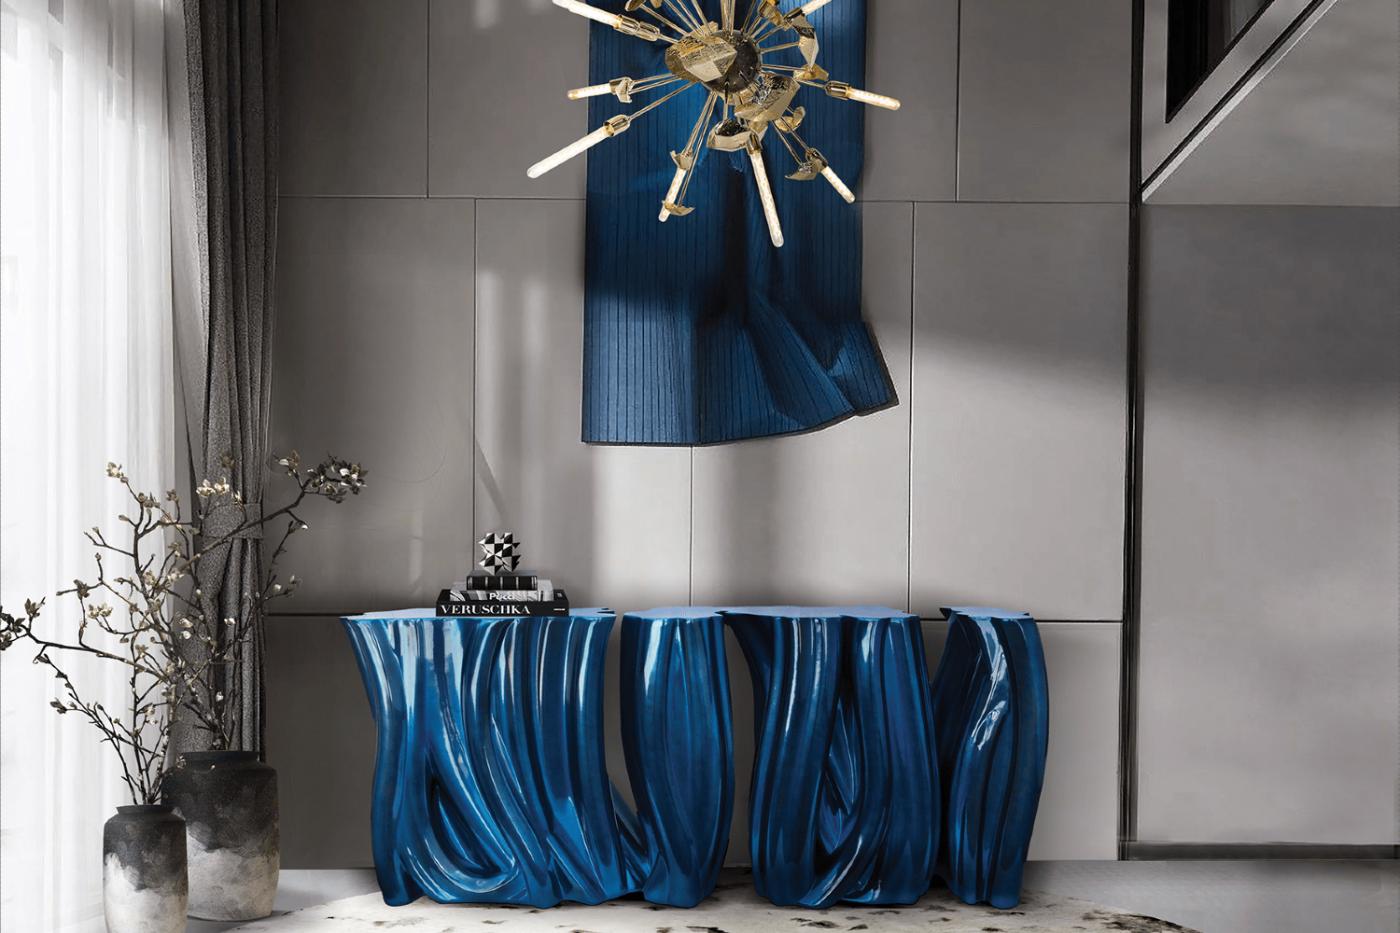 luxury furniture Blue and Gold – Luxury Furniture Inspiration monochrome blue sideboard 04 boca do lobo 1 1 1400x933